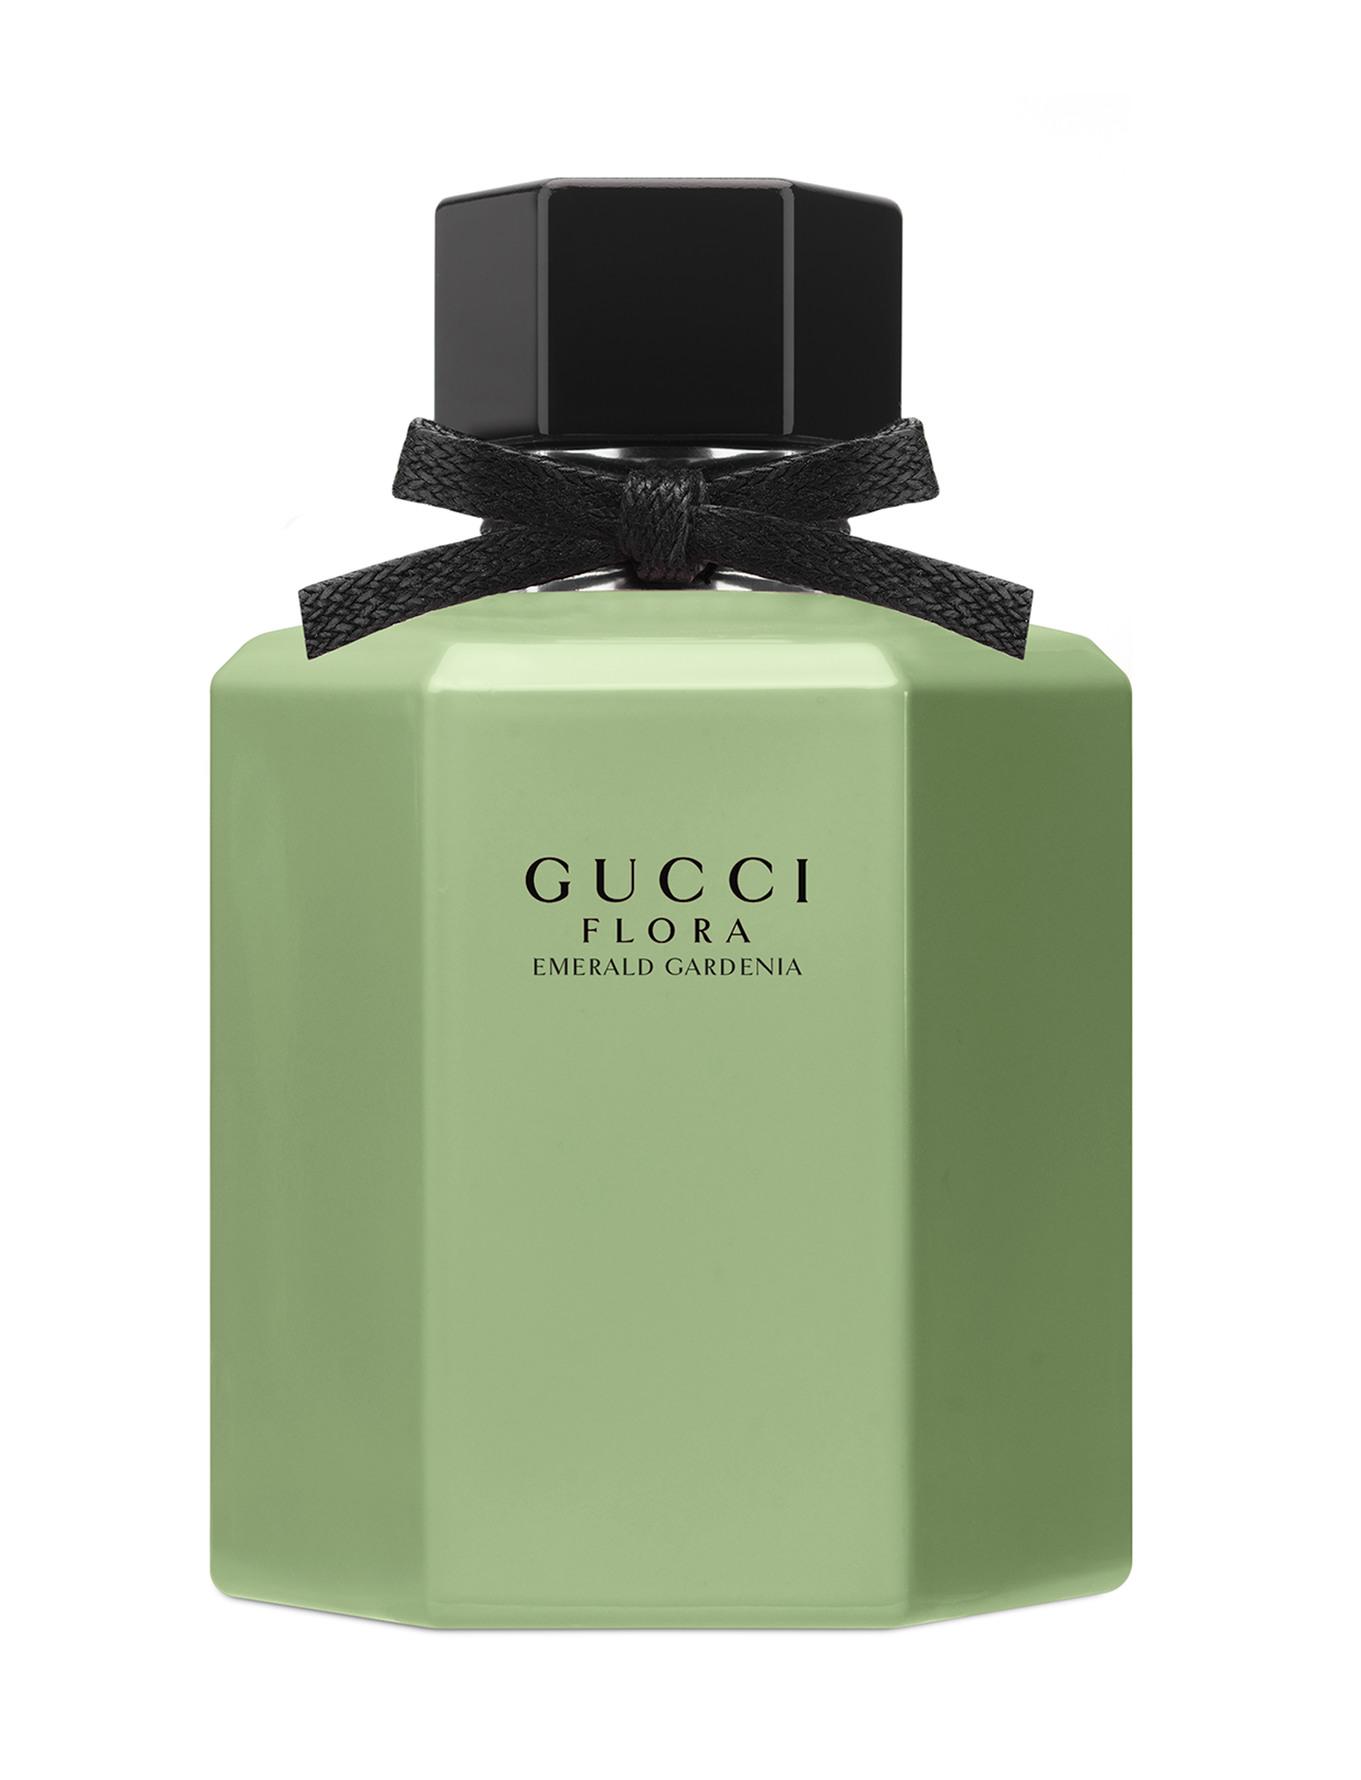 Gucci Flora by Gucci Emerald Gardenia Гуччи Флора Эмеральд Гардения